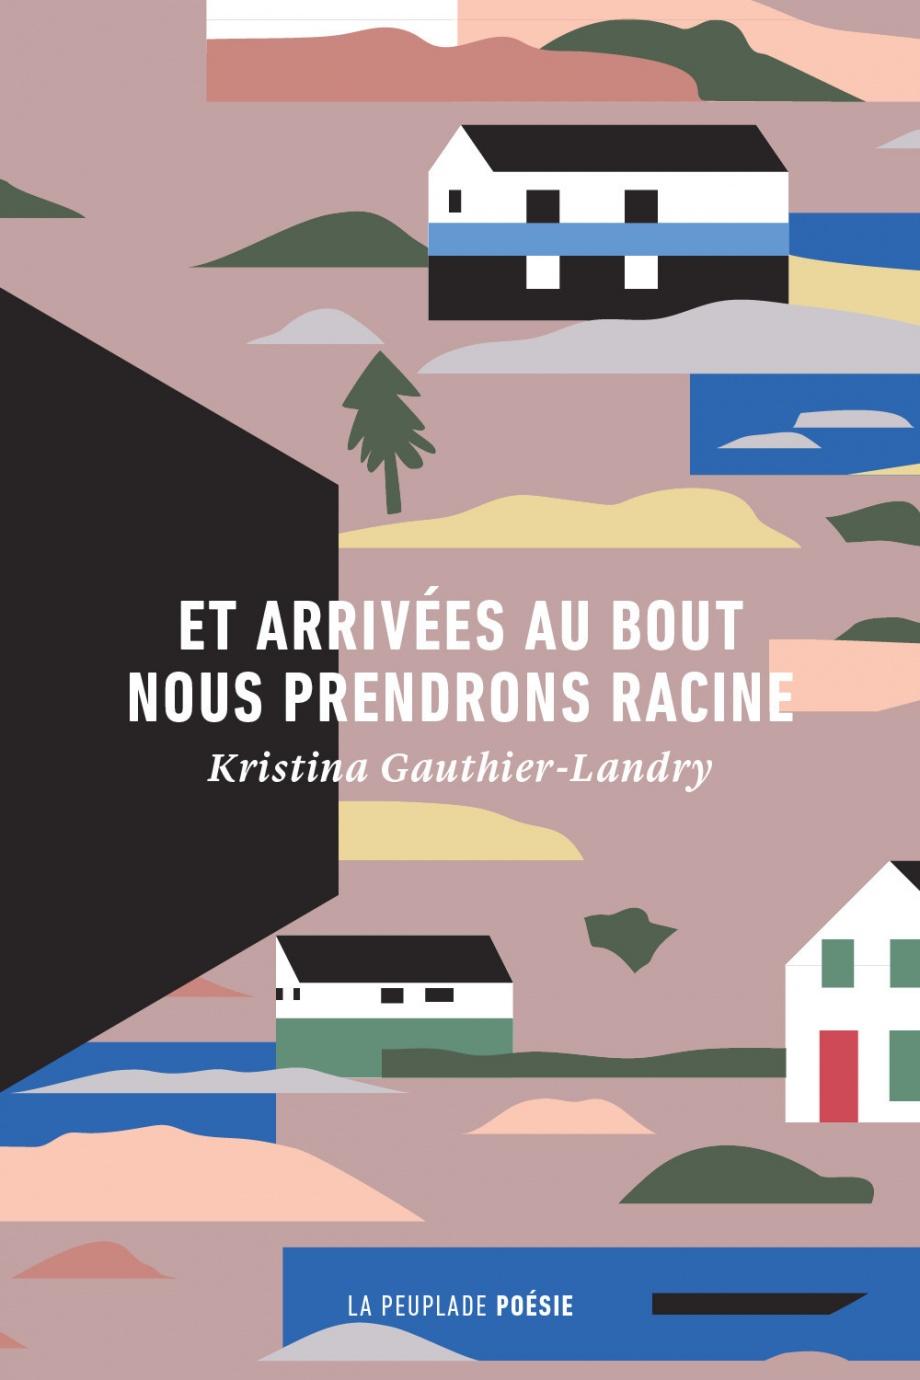 Kristina Gauthier-Landry